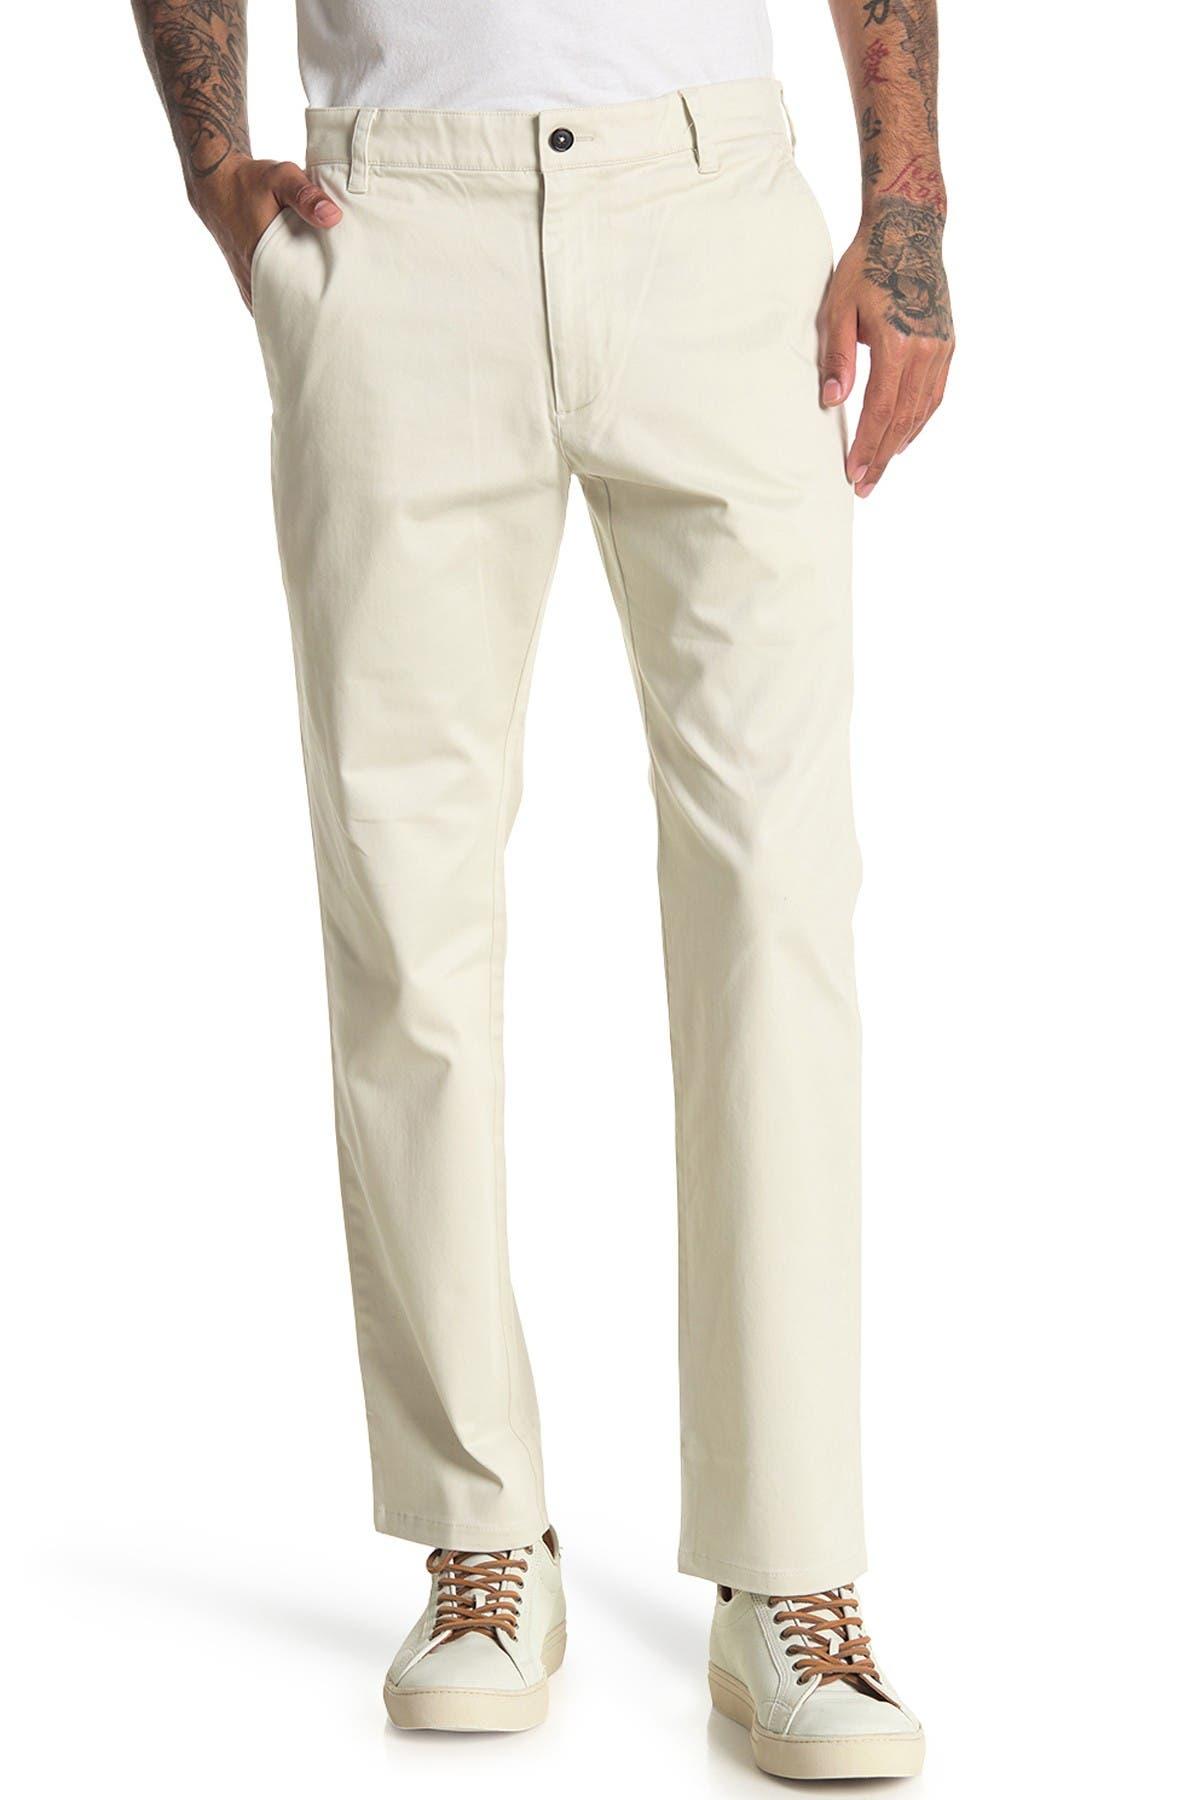 Image of Oxford Hadfield Chino Pants